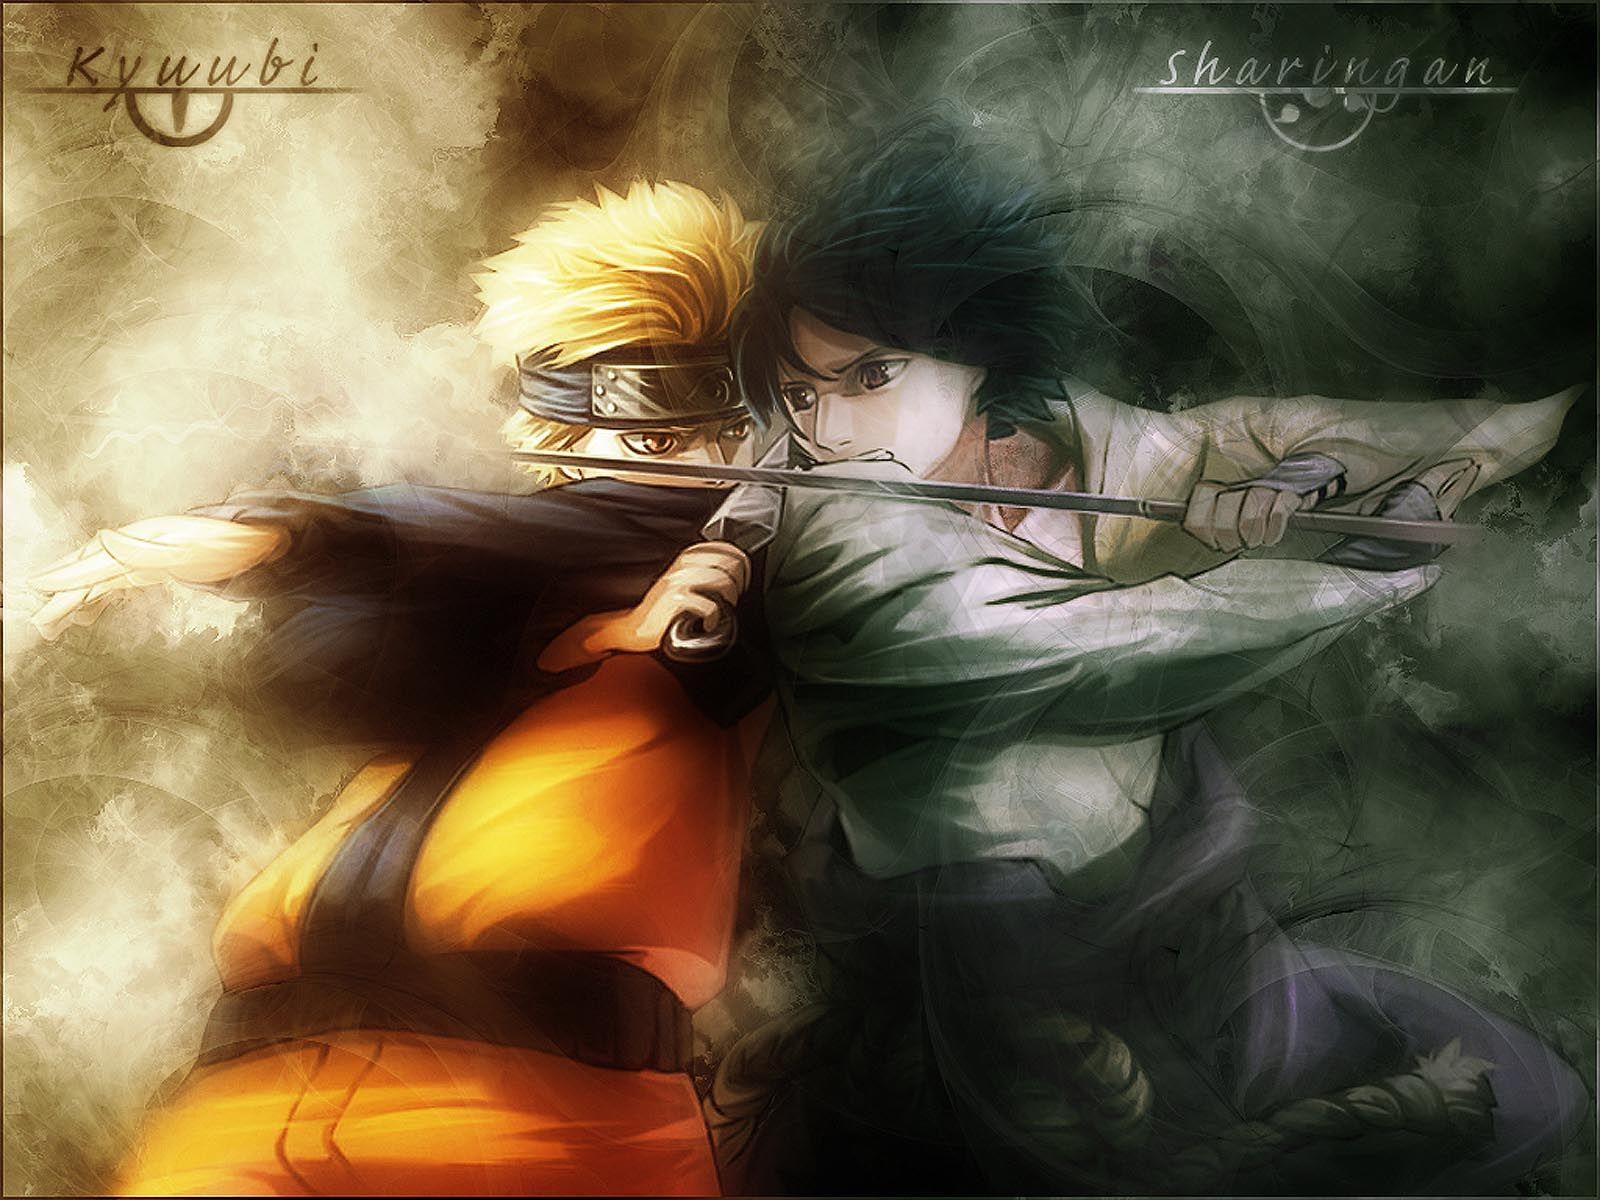 Best Wallpaper Naruto Ipad - 1a53f0f7dcdf89480e64ddcd38379ee6  Snapshot_628668.jpg